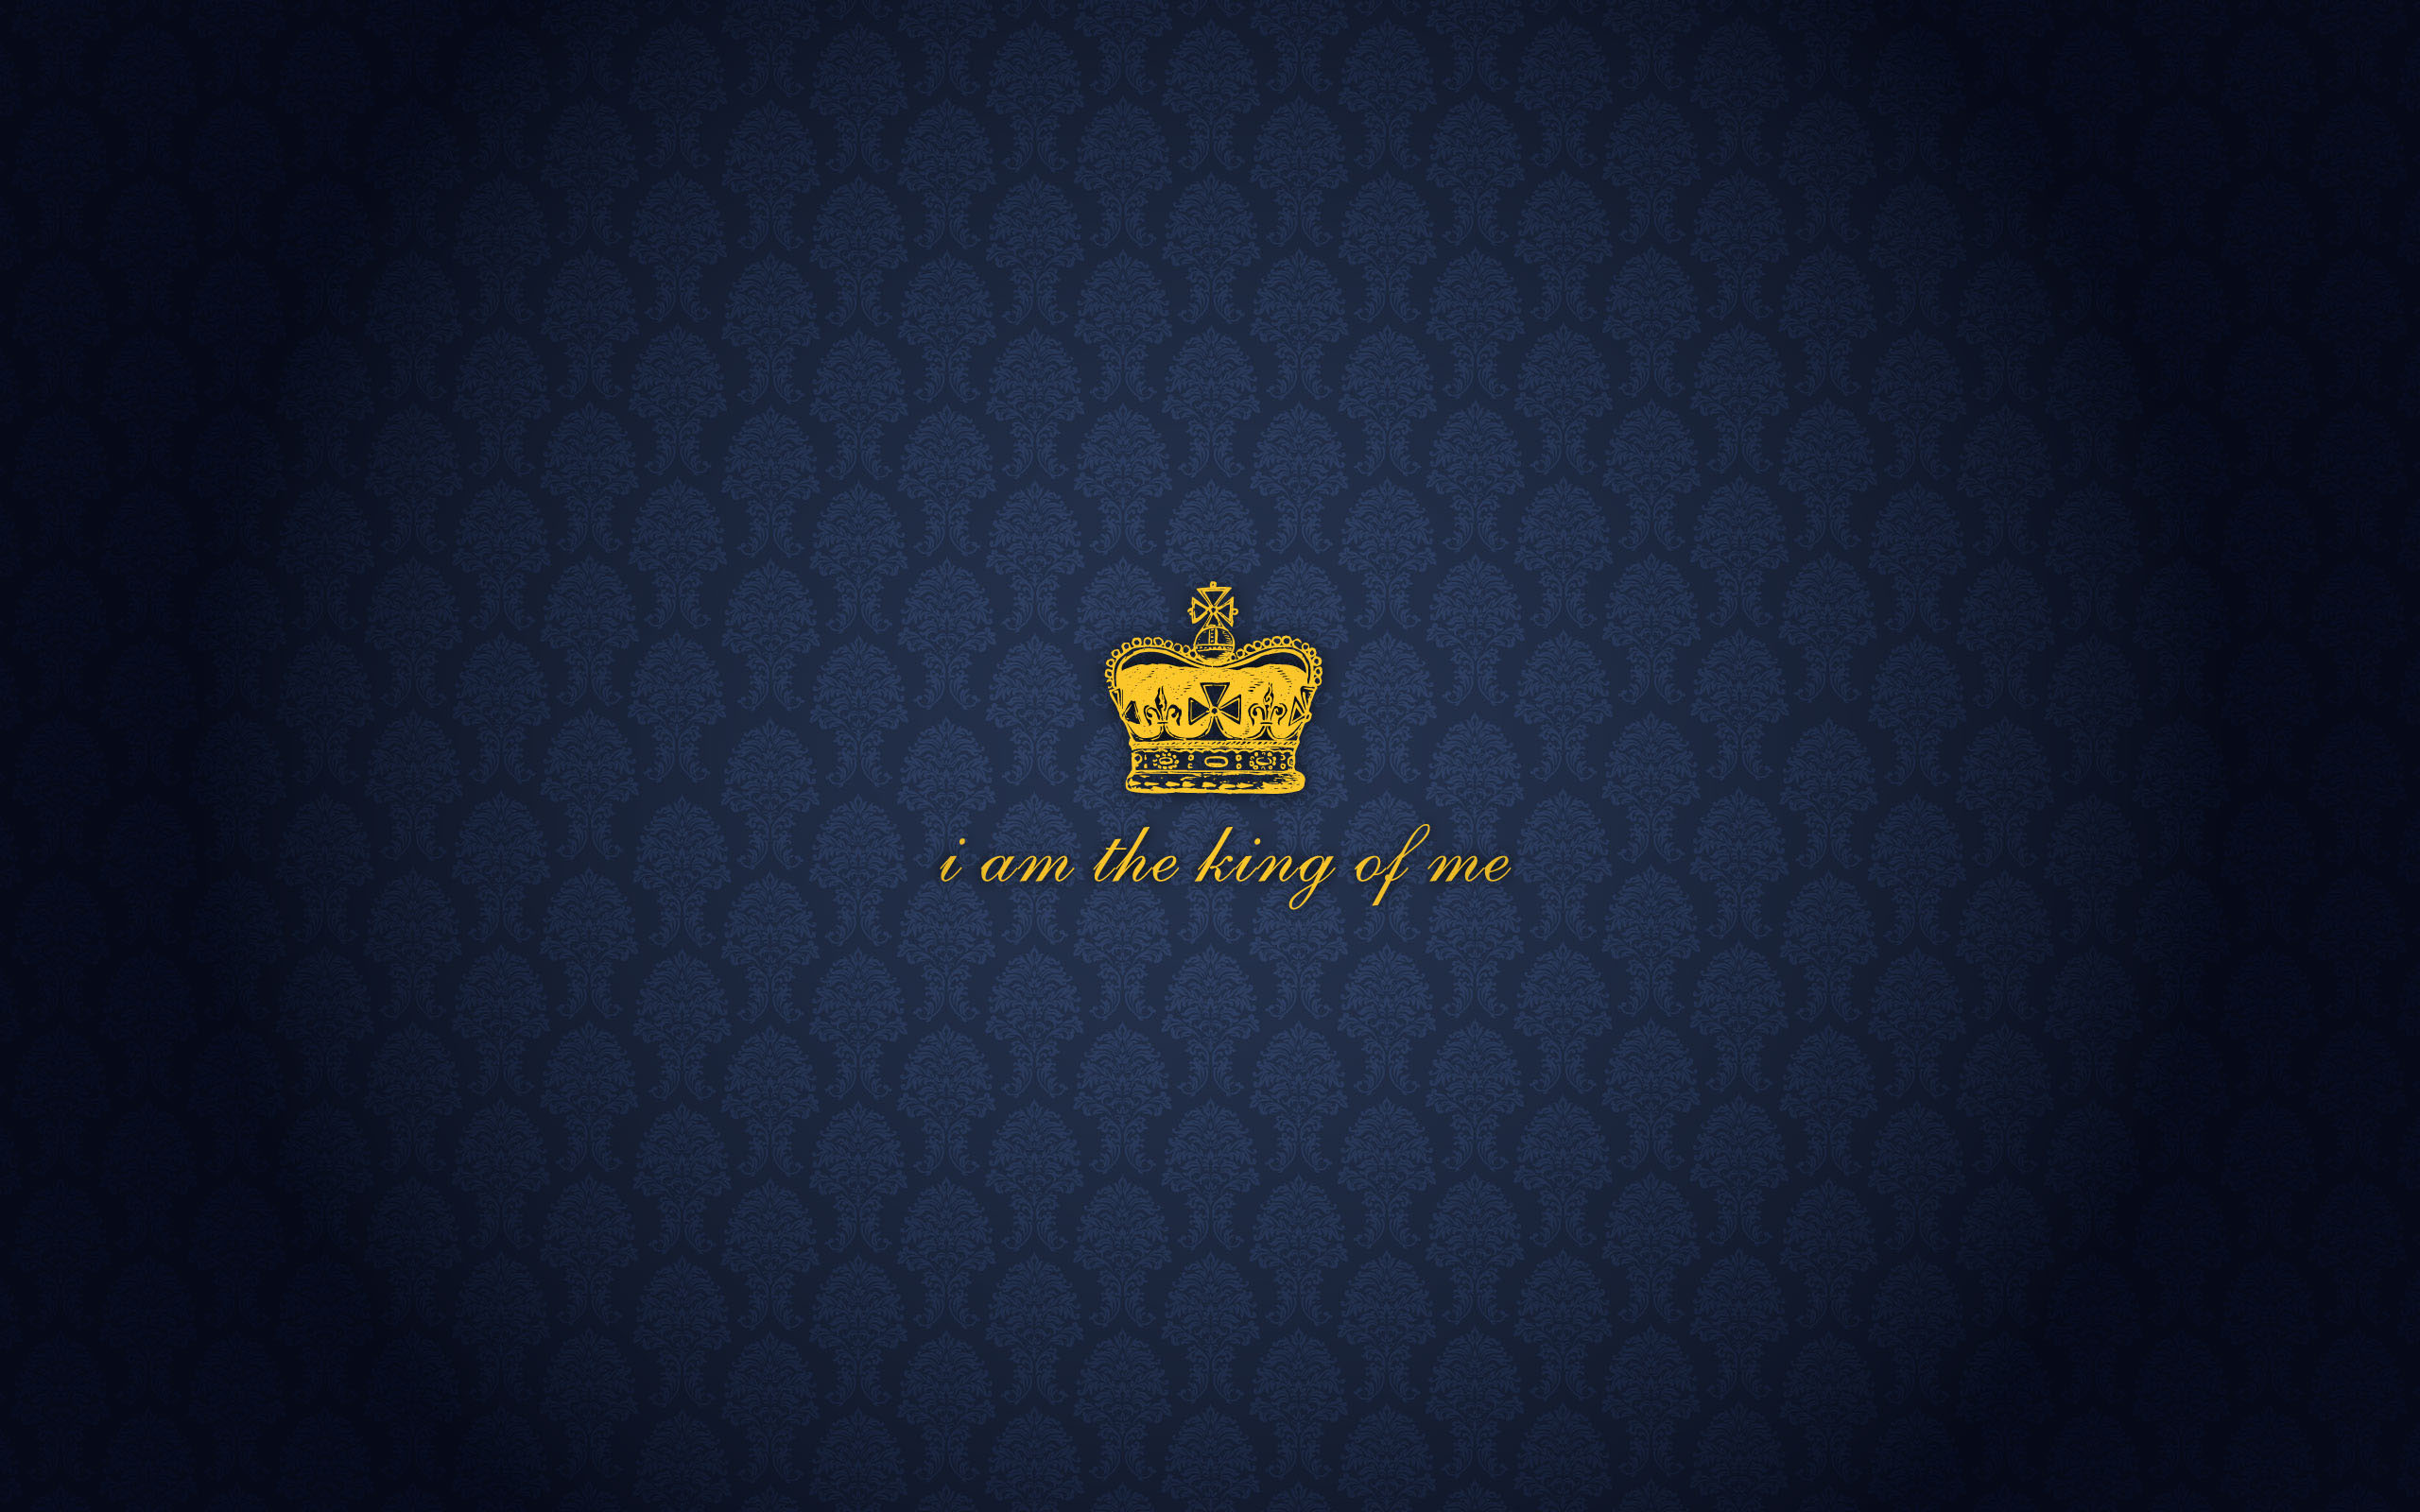 Mac Desktop Wallpapers HD Royal Mac Desktop Wallpapers HD The Kingdom 2560x1600